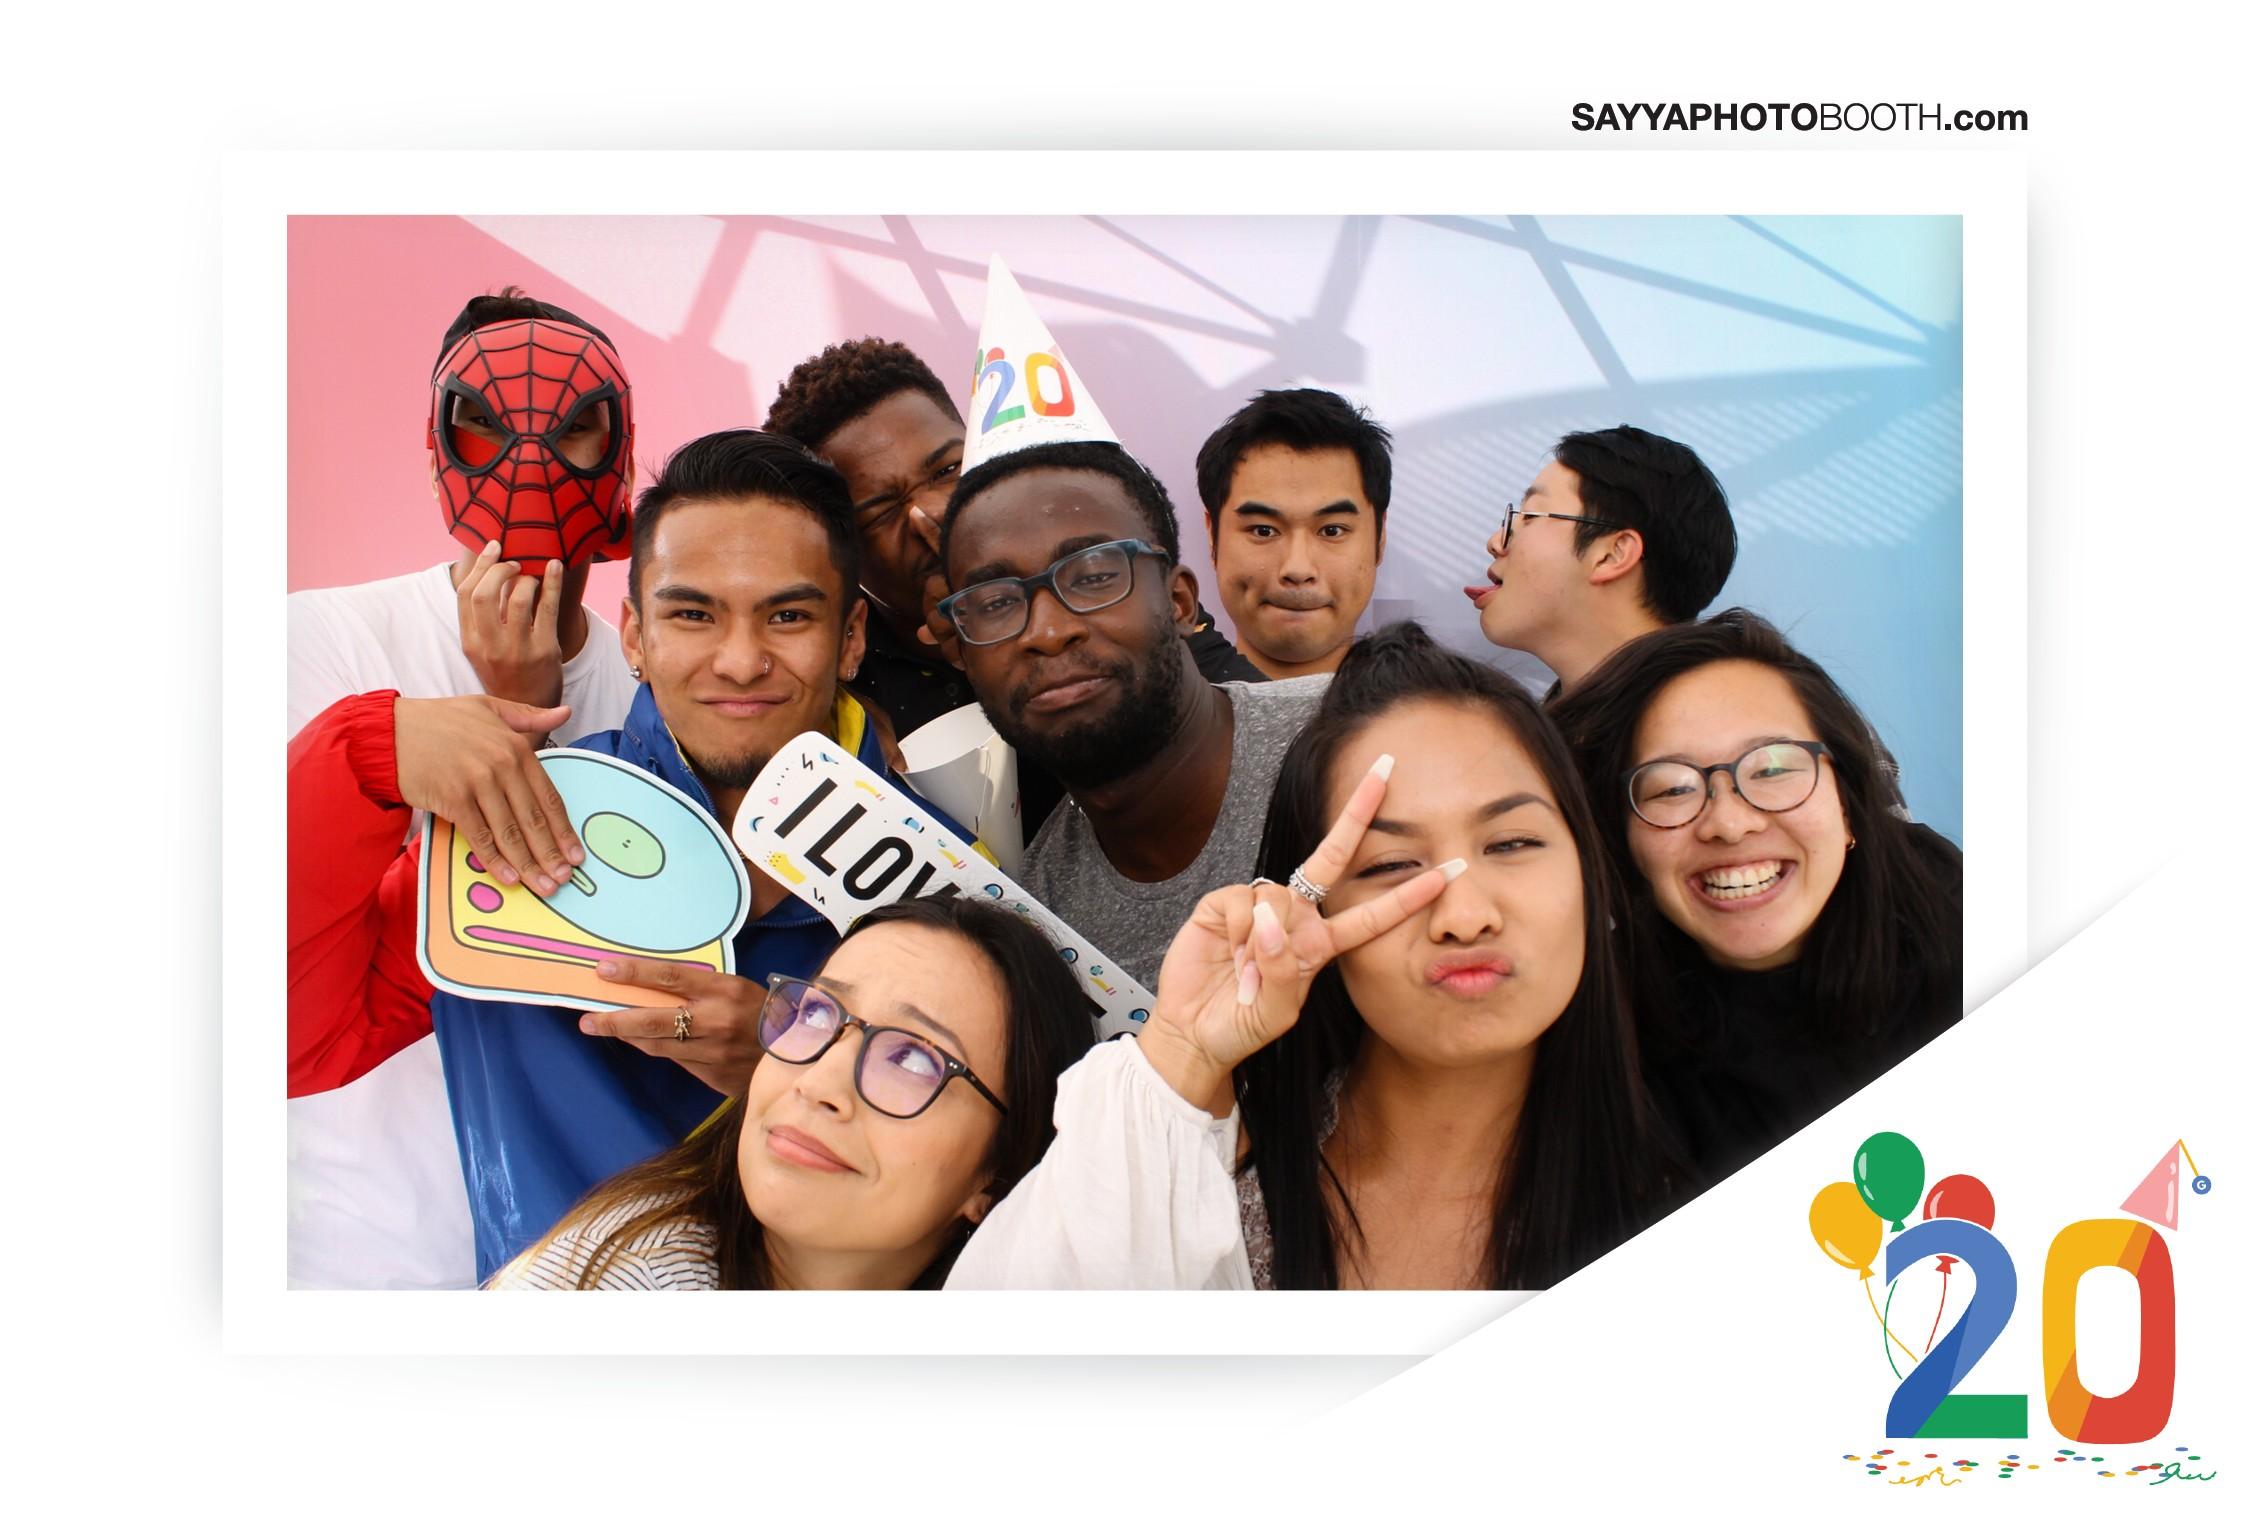 Google's 20th Birthday - Booth 6